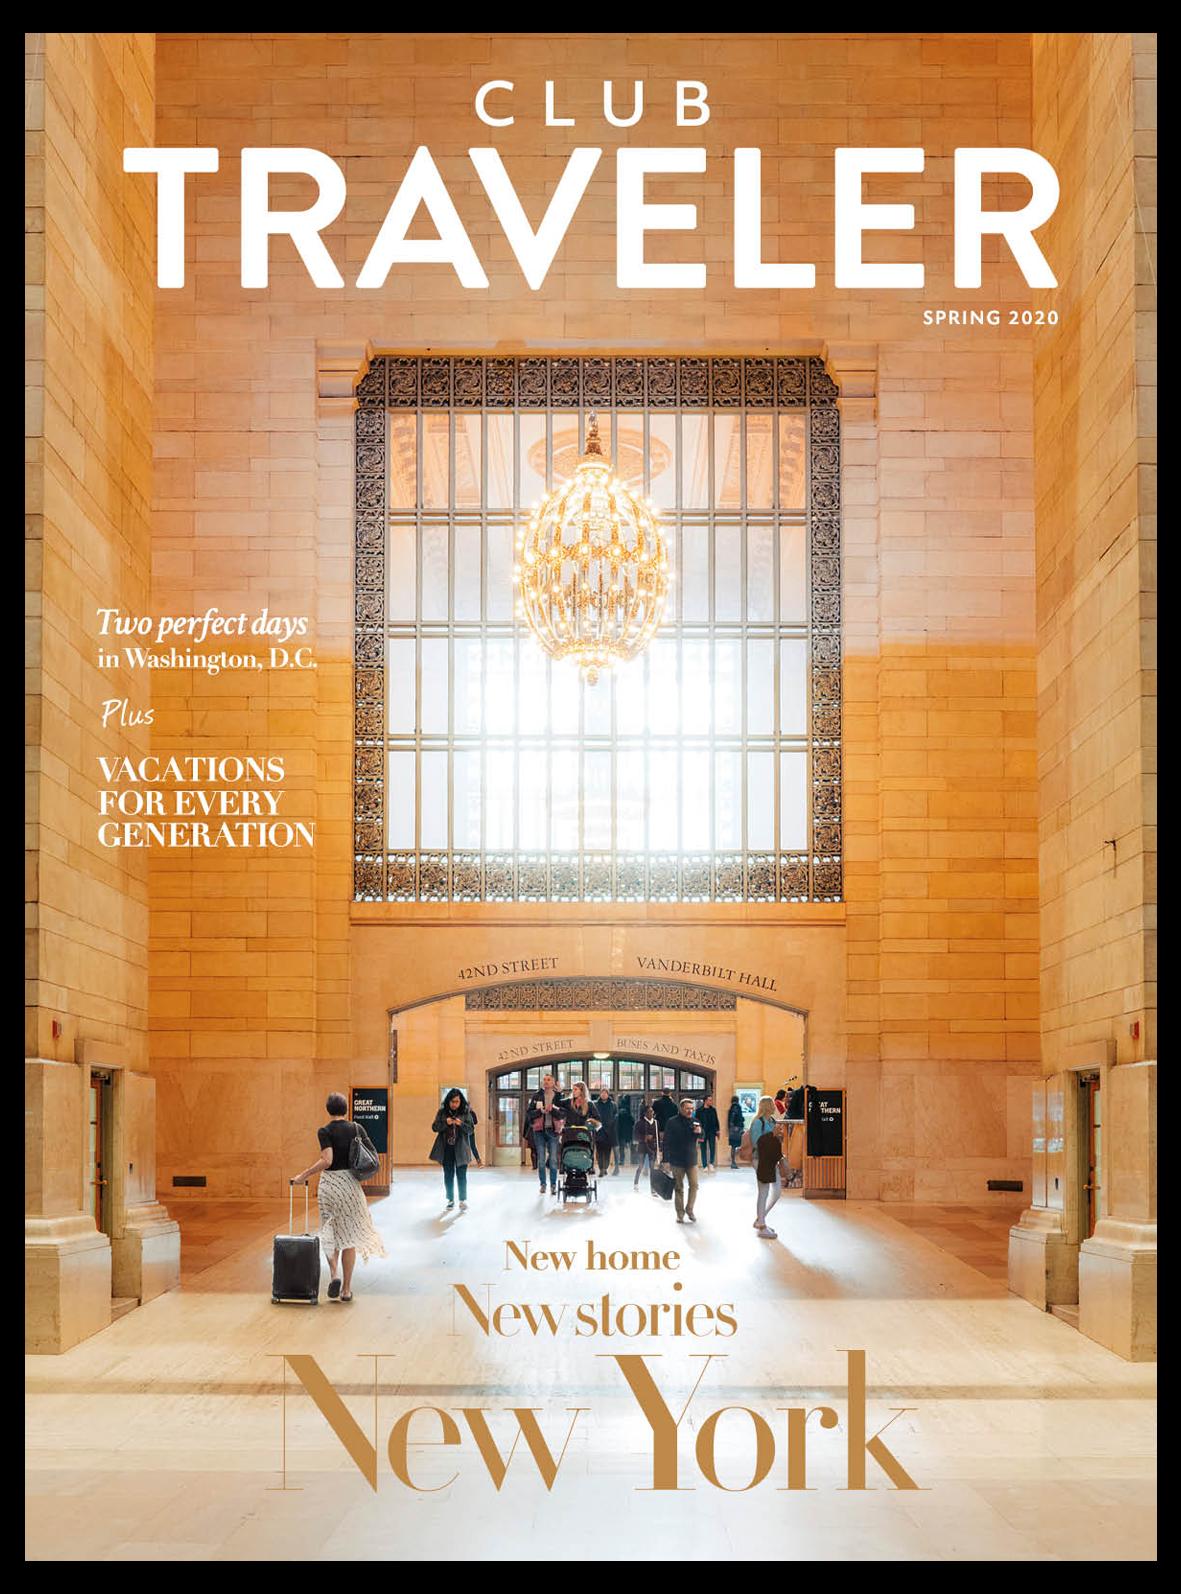 Spring 2020 Club Traveler